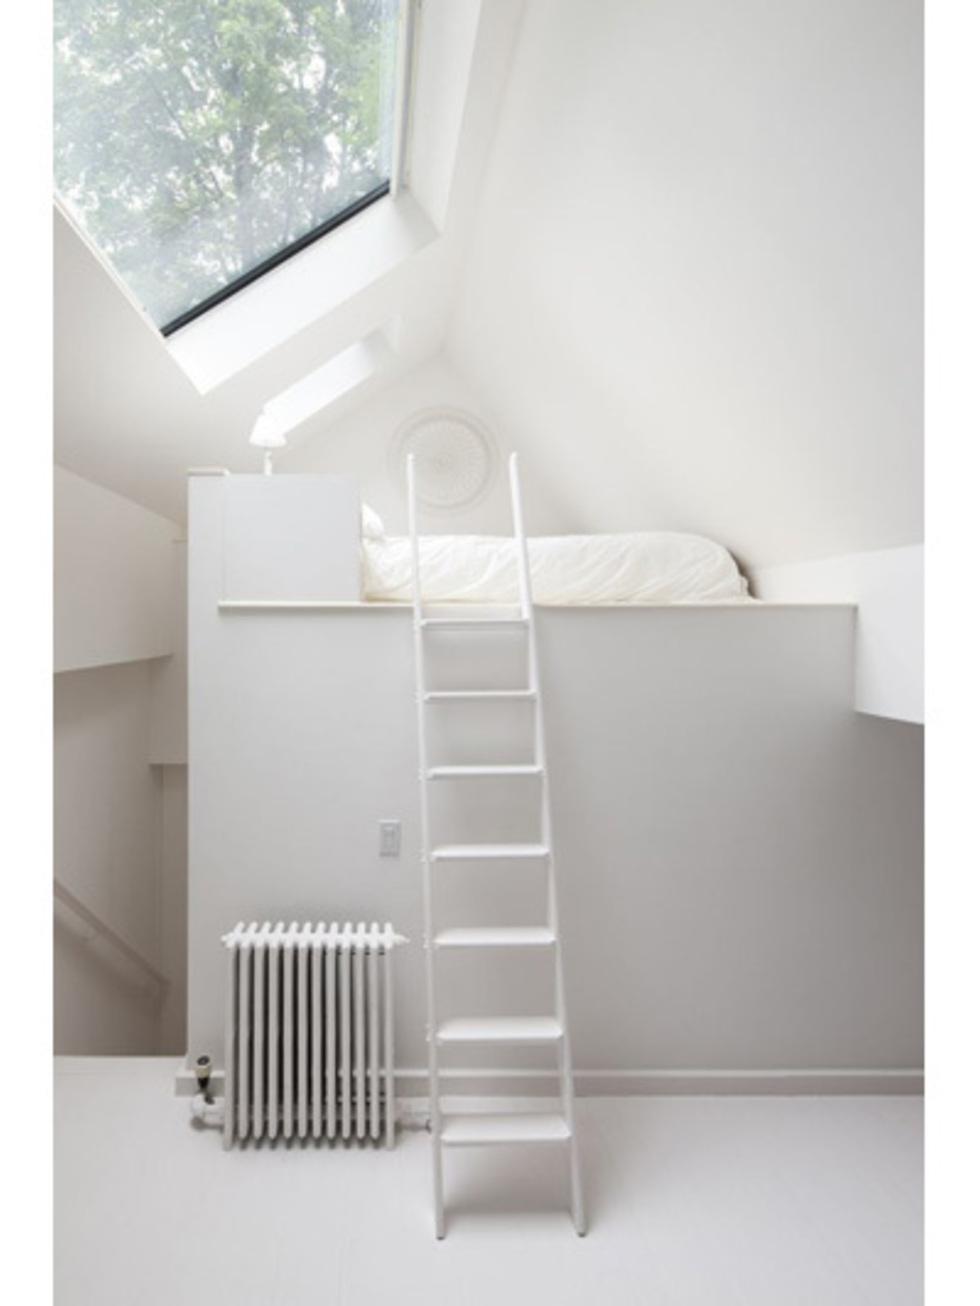 Trapgat ideeen interesting best laundry room images on for Trapgat behangen